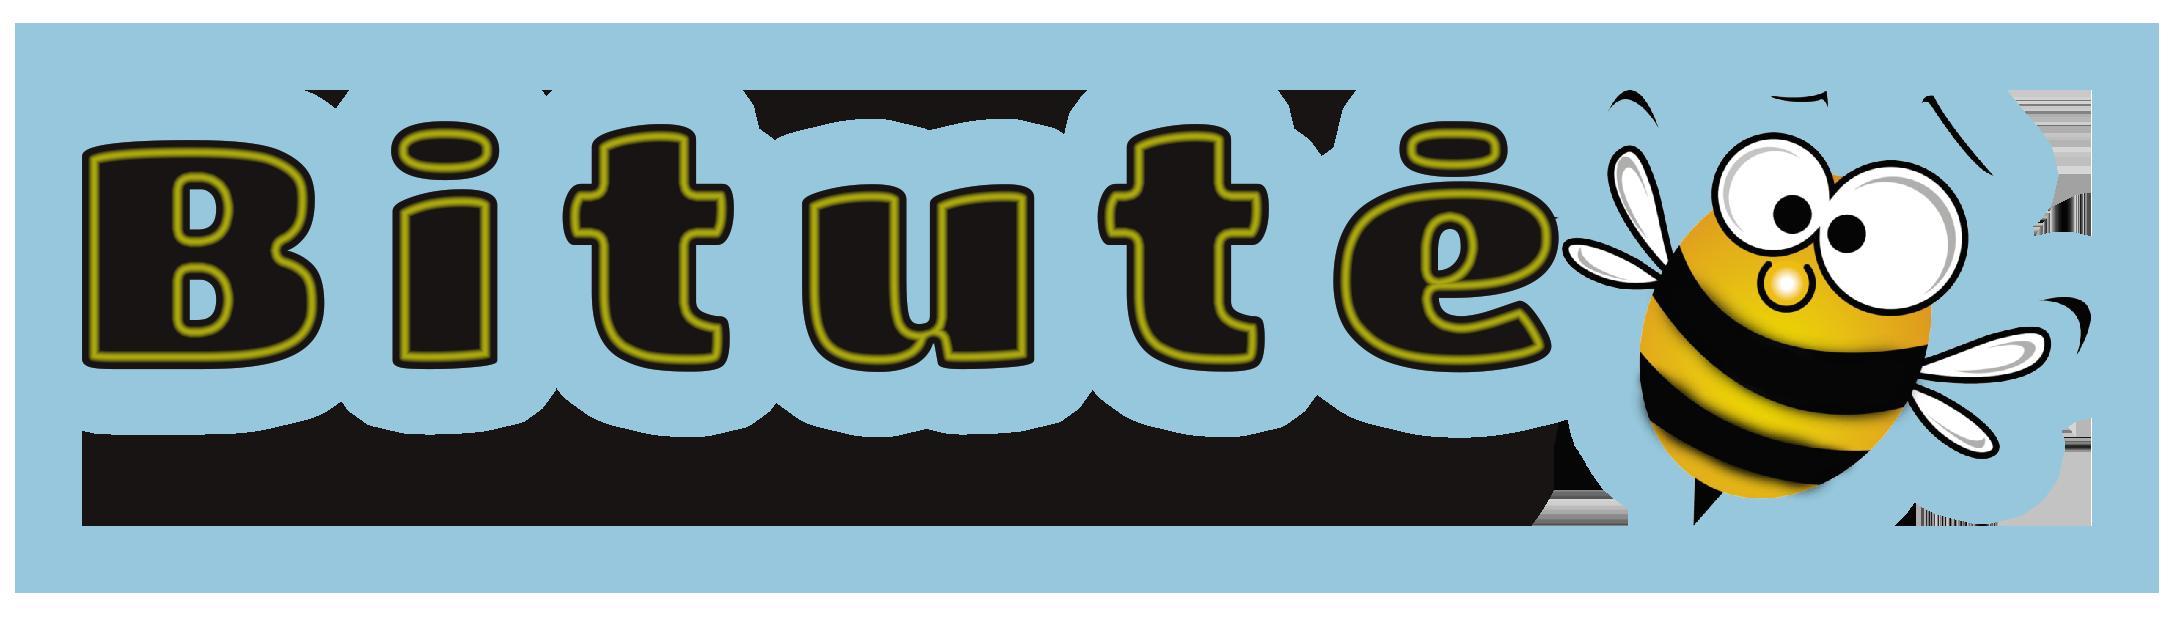 Bitutė